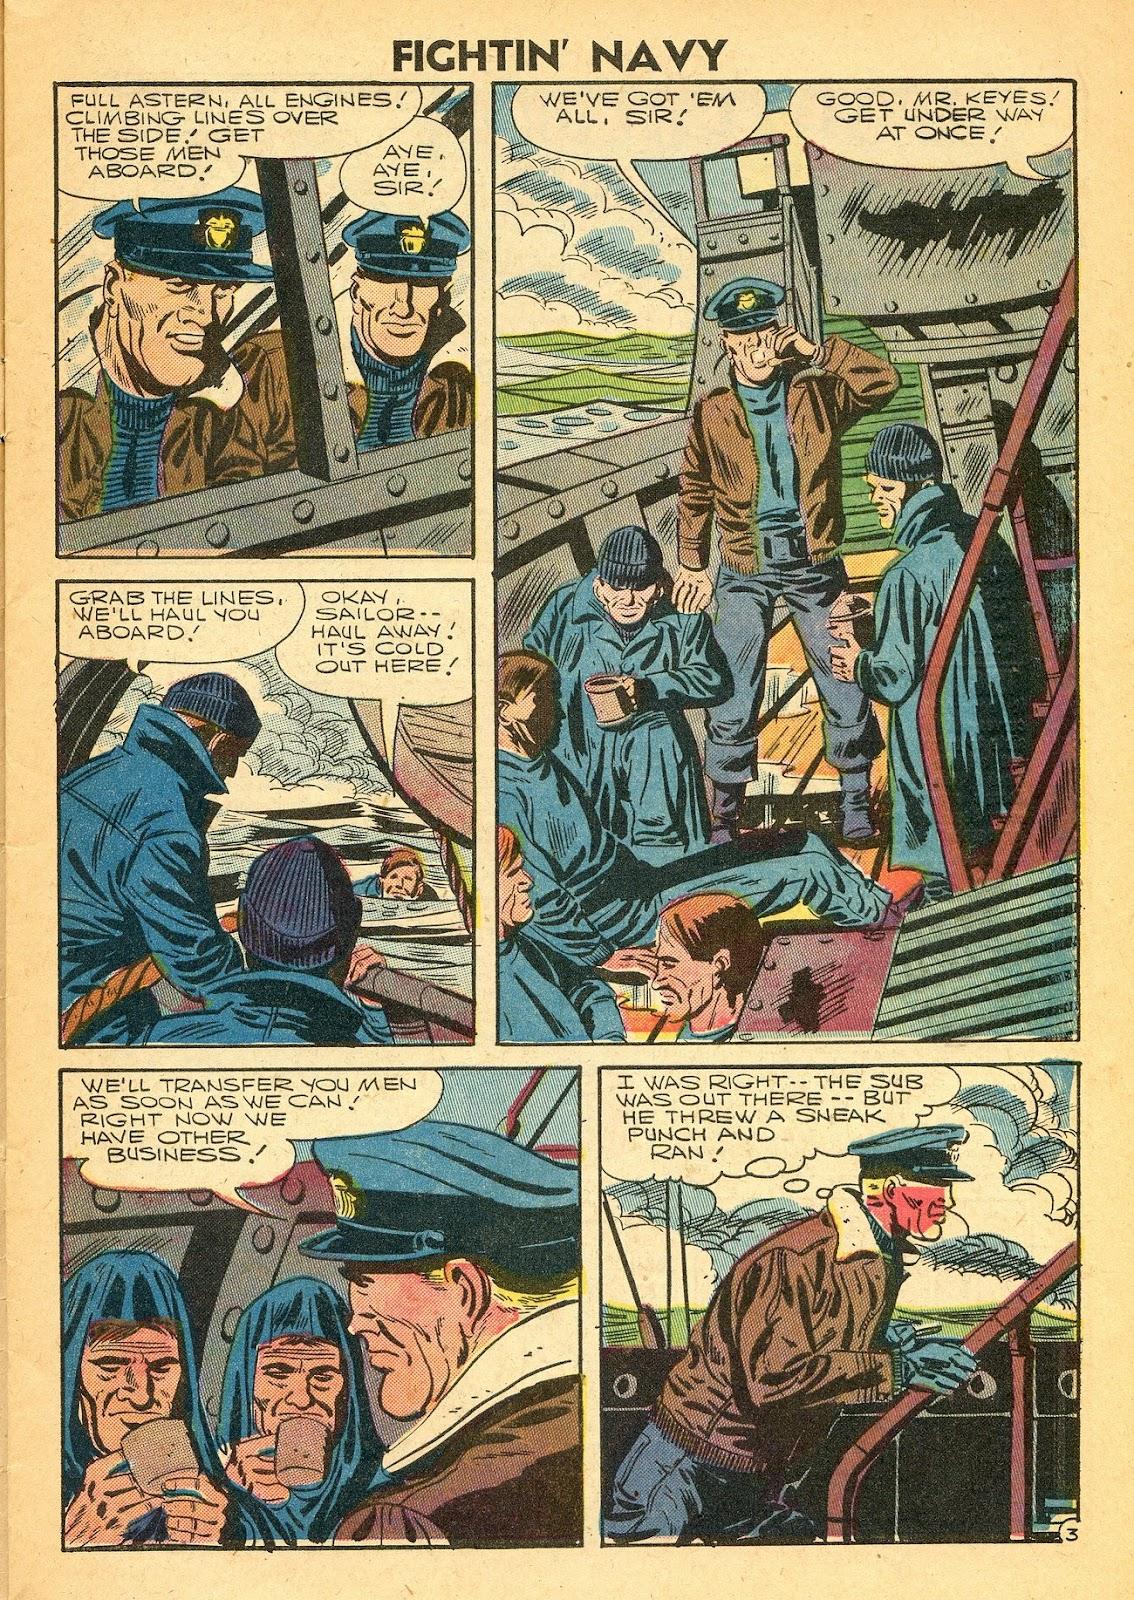 Read online Fightin' Navy comic -  Issue #77 - 5